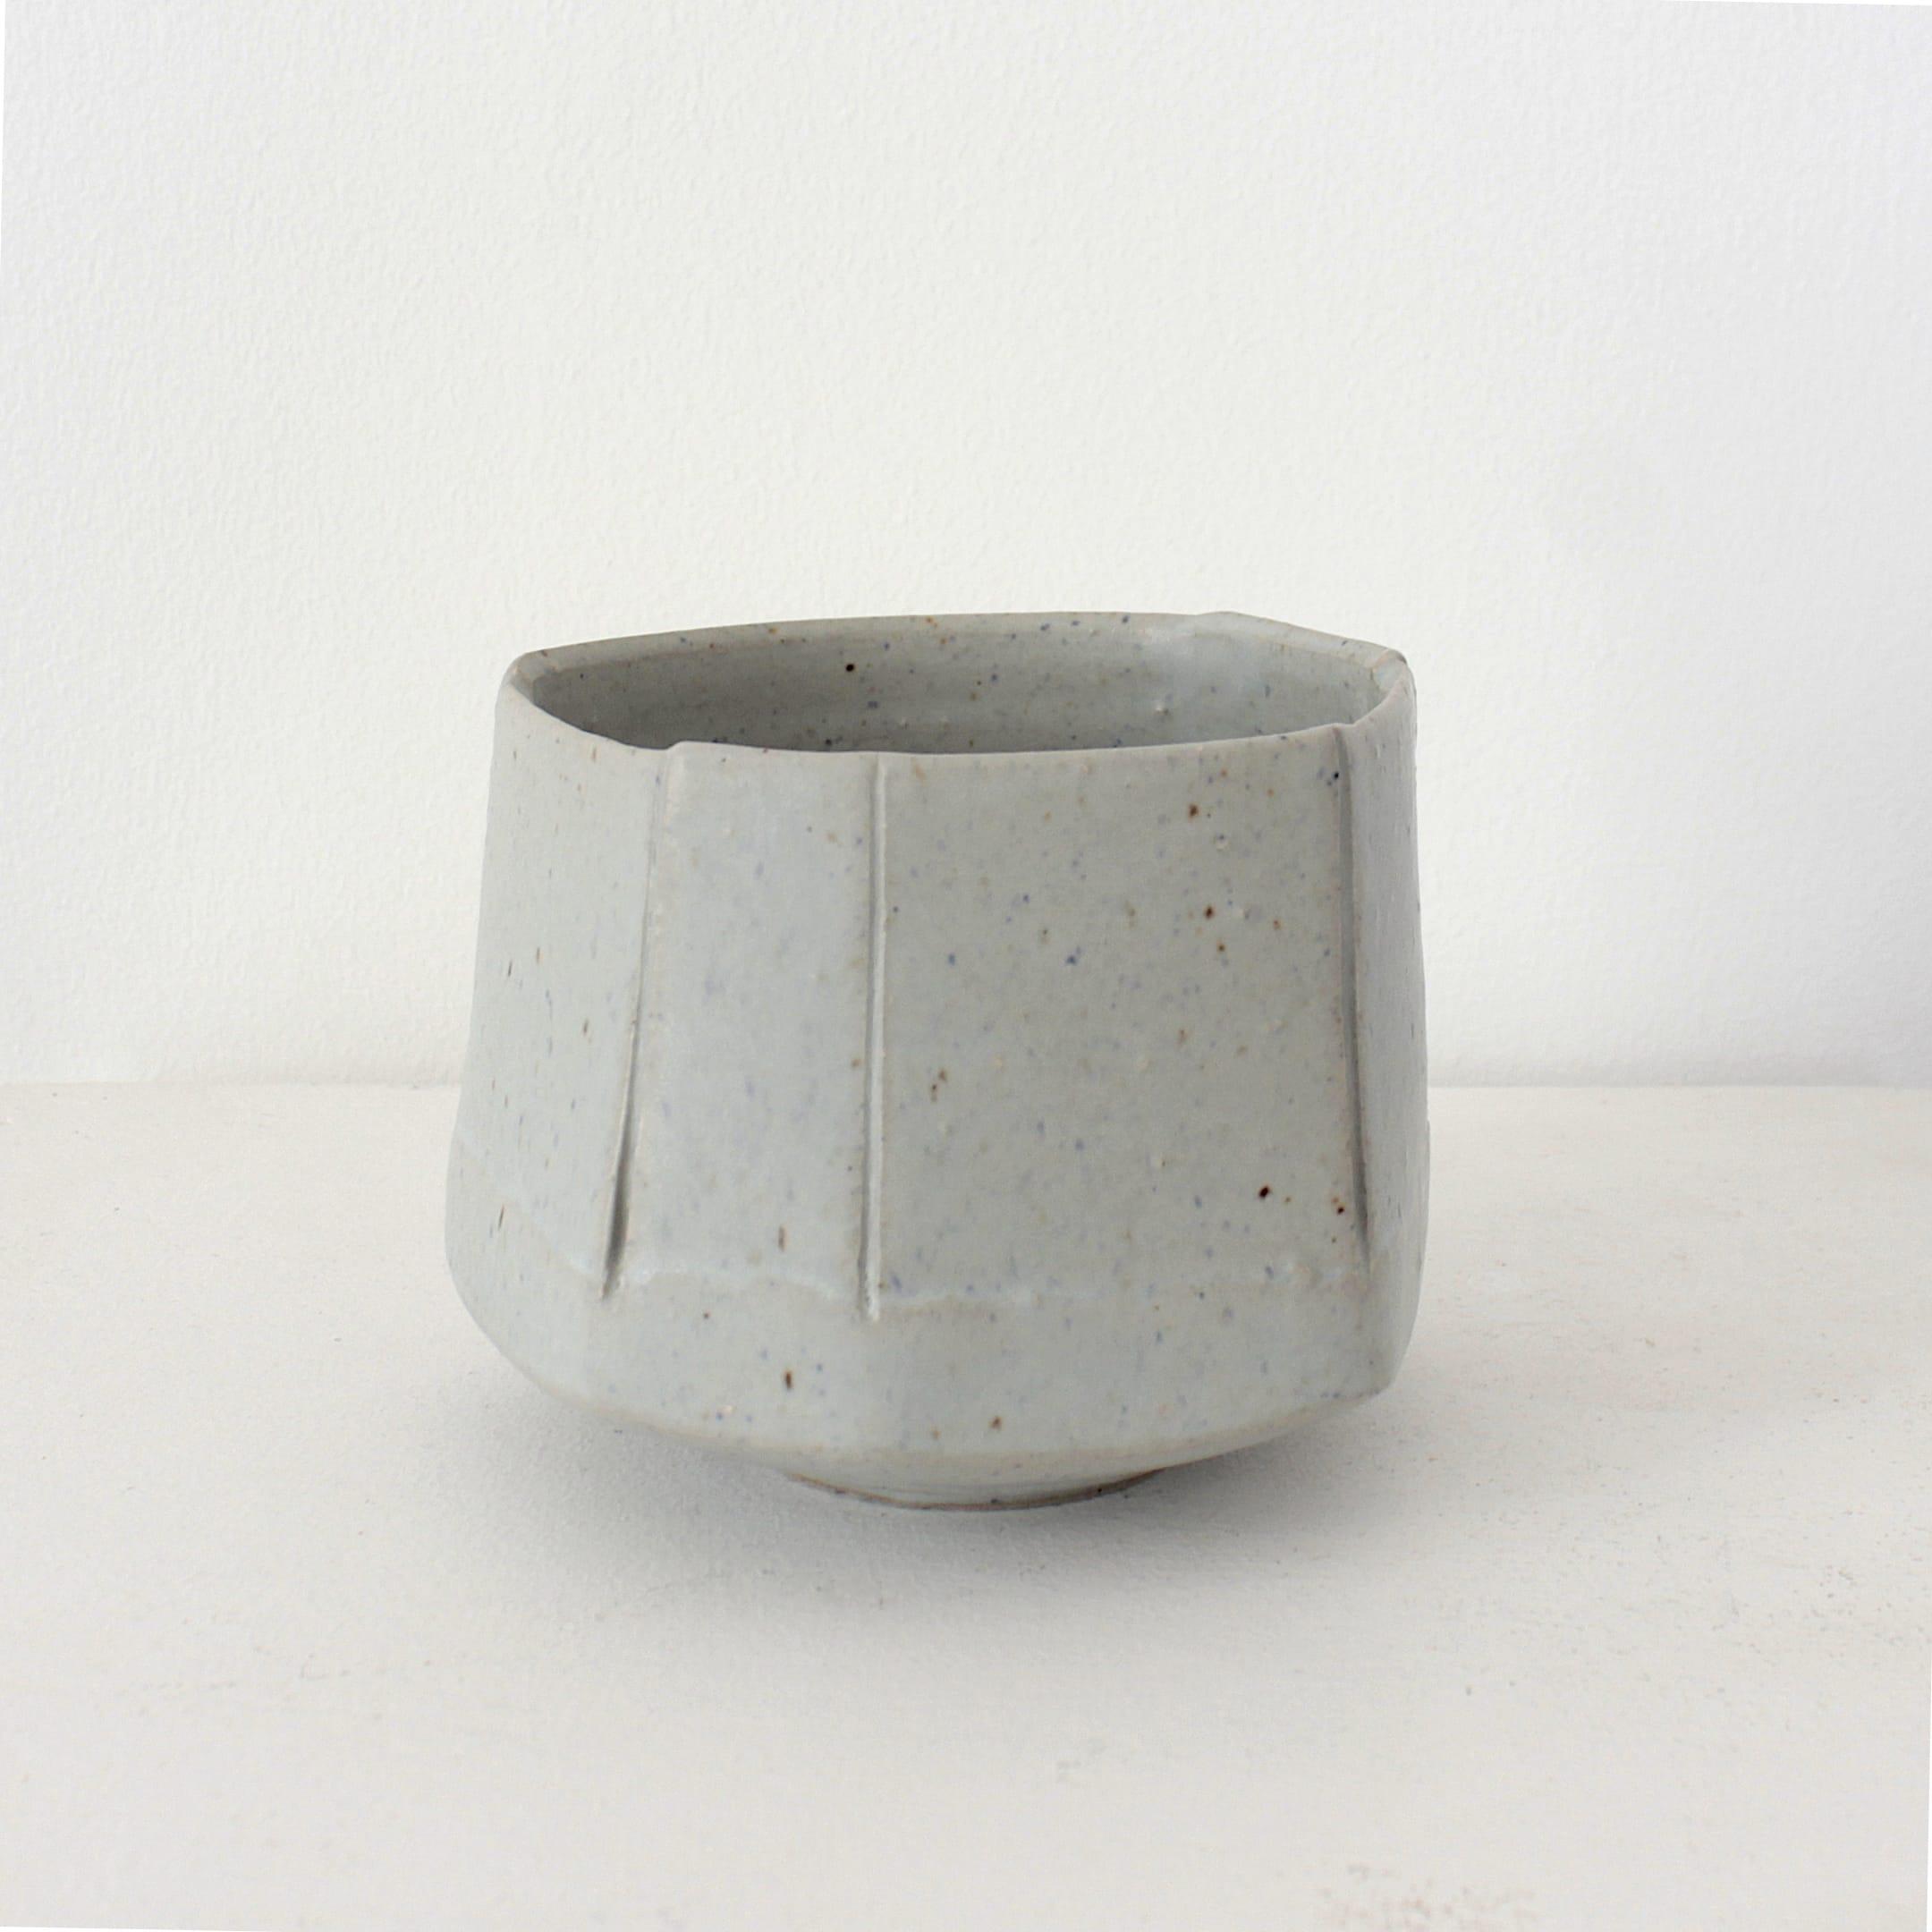 "<span class=""link fancybox-details-link""><a href=""/artists/99-carina-ciscato/works/7885-carina-ciscato-small-coloured-porcelain-teabowl-2021/"">View Detail Page</a></span><div class=""artist""><strong>Carina Ciscato</strong></div> <div class=""title""><em>Small Coloured Porcelain Teabowl</em>, 2021</div> <div class=""signed_and_dated"">artist stamp</div> <div class=""medium"">porcelain</div> <div class=""dimensions"">8.5 x 11 x 9.5 cm</div><div class=""price"">£330.00</div><div class=""copyright_line"">Own Art: £33 x 10 Months, 0% APR</div>"